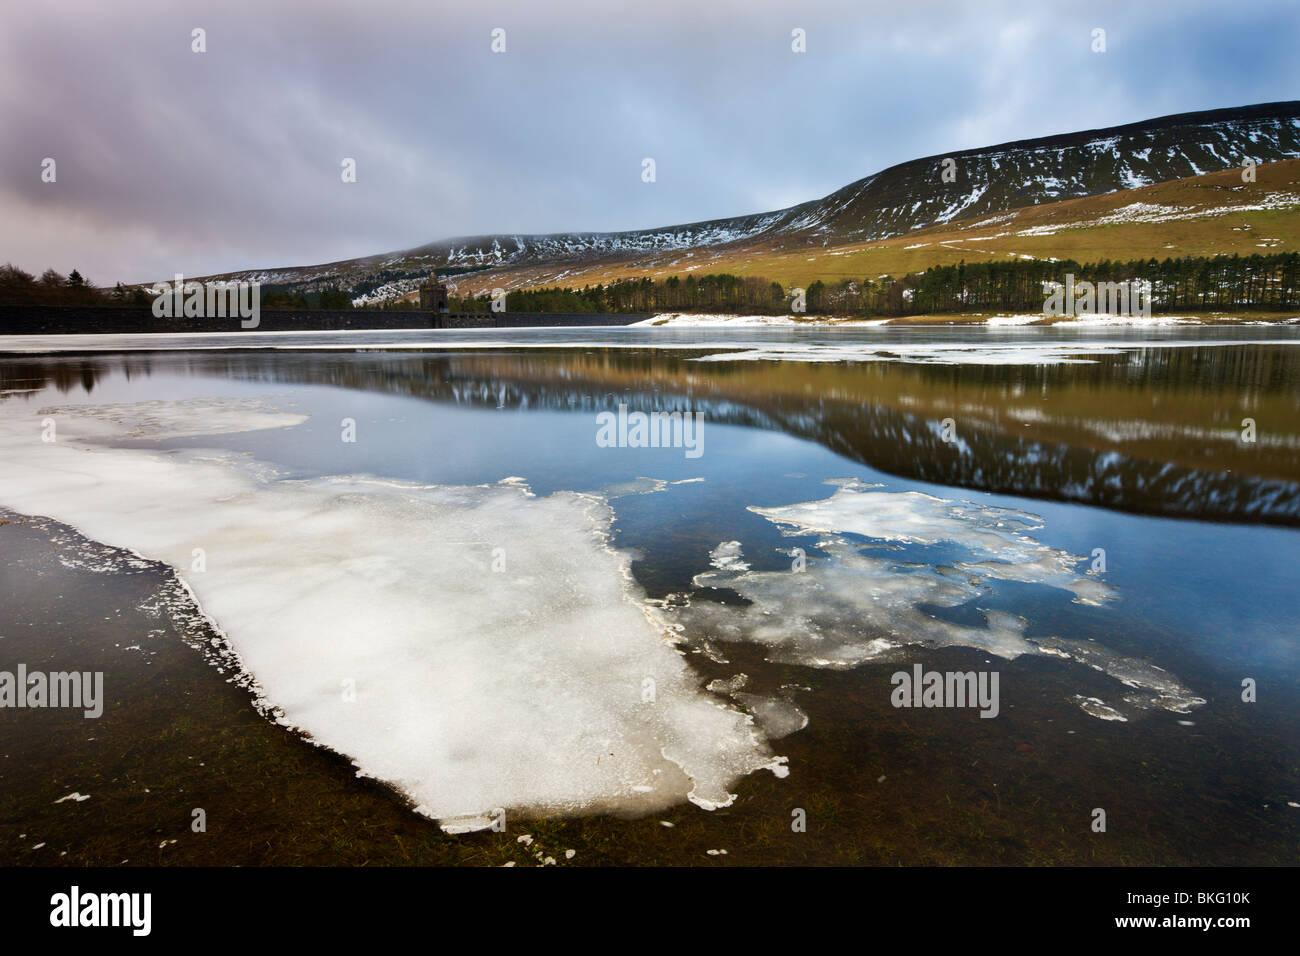 Oberen Neuadd Reservoir, Brecon Beacons National Park, Powys, Wales, UK. Winter Stockbild